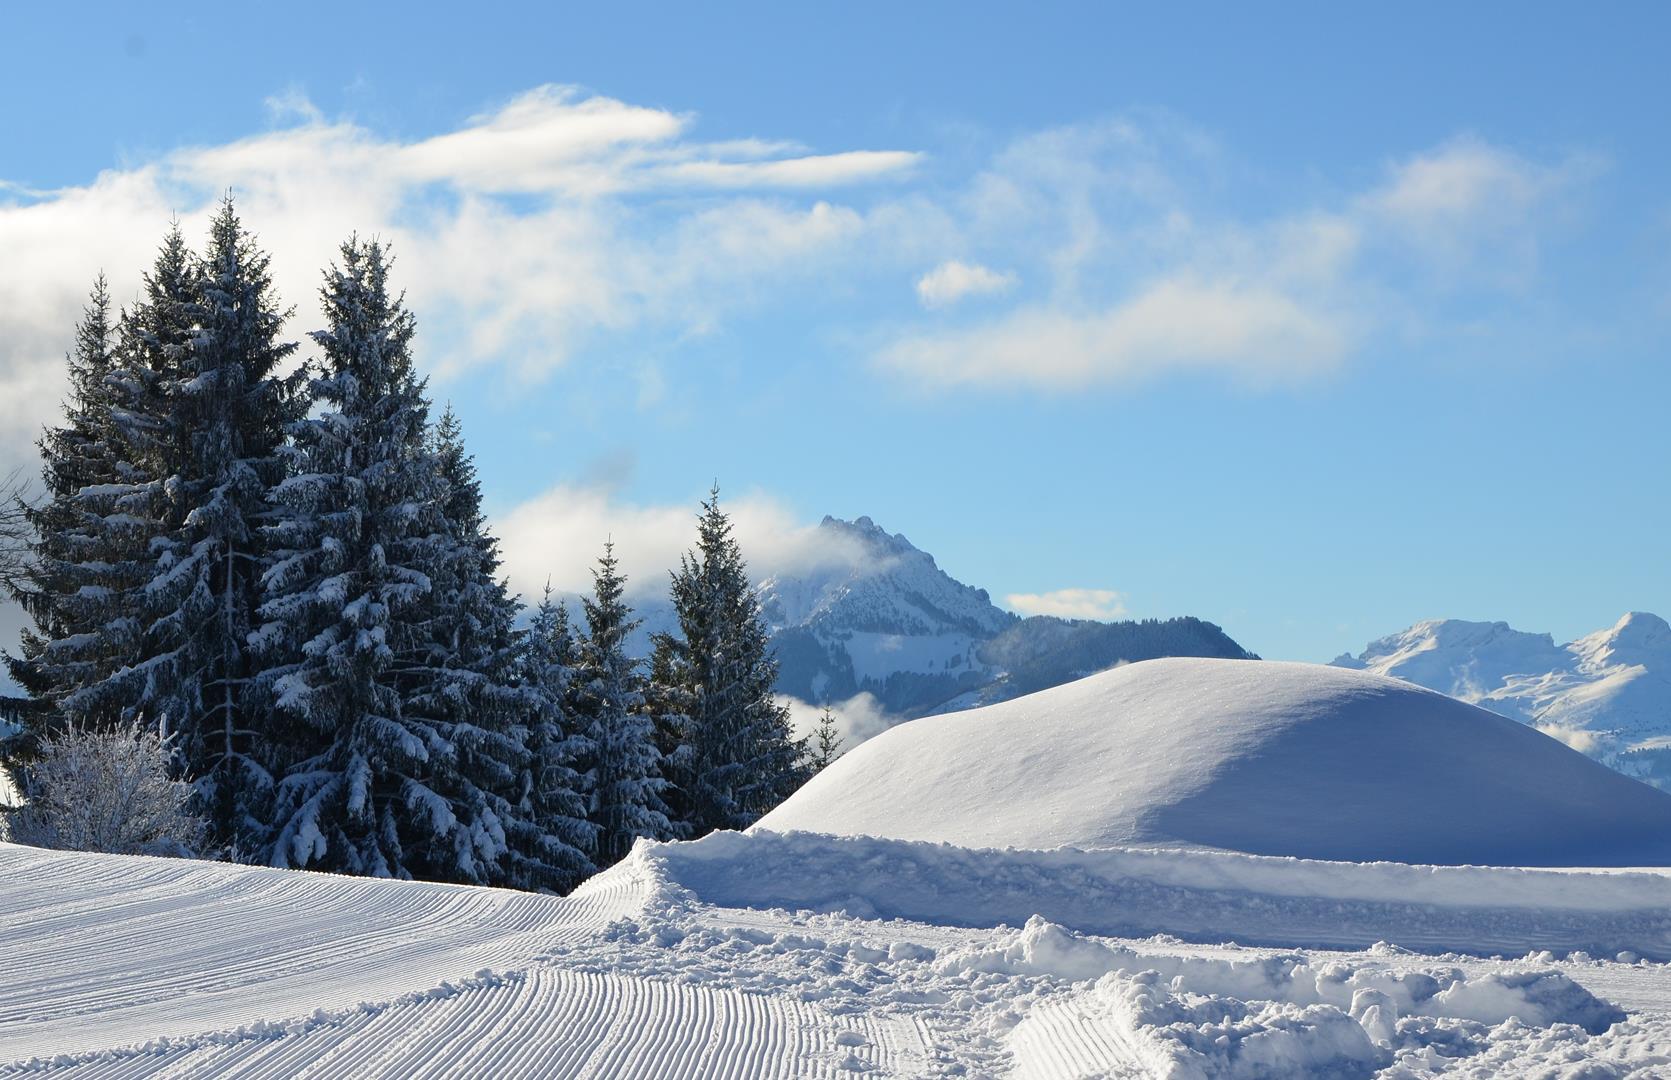 Winter 151217.44 (Copy).JPG